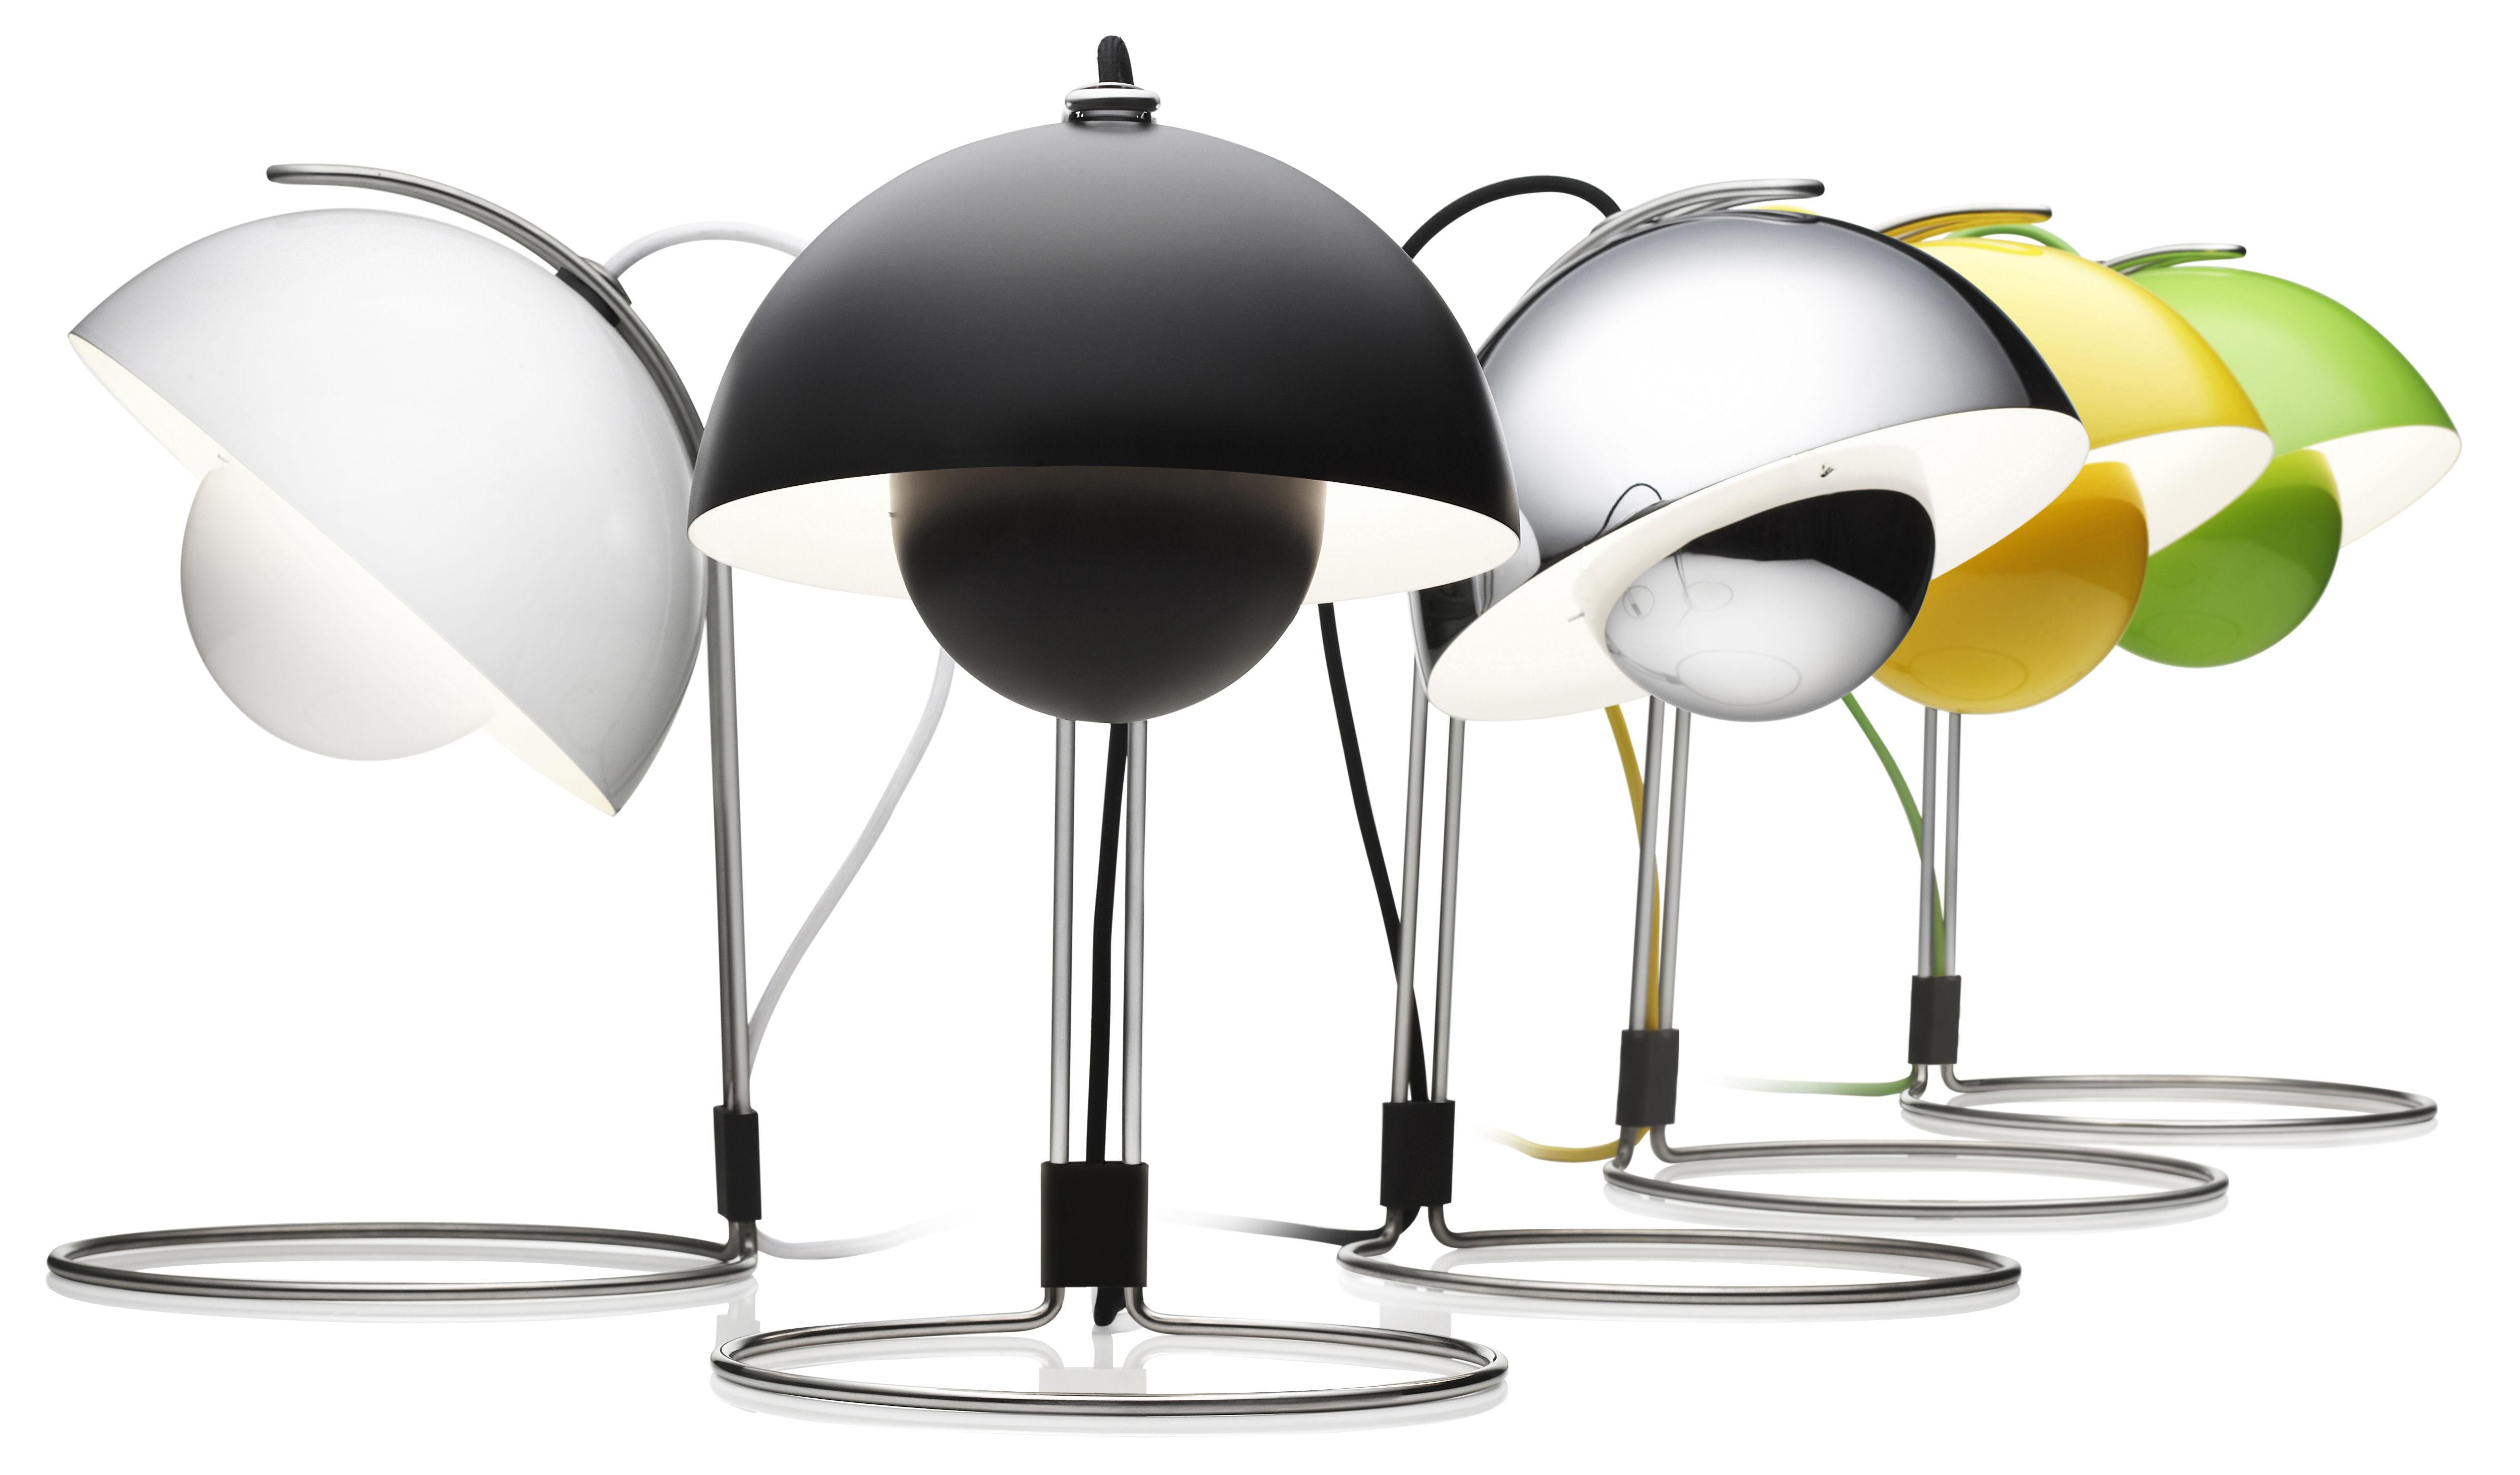 lampe de table flowerpot vp4 h 36 cm by verner panton. Black Bedroom Furniture Sets. Home Design Ideas